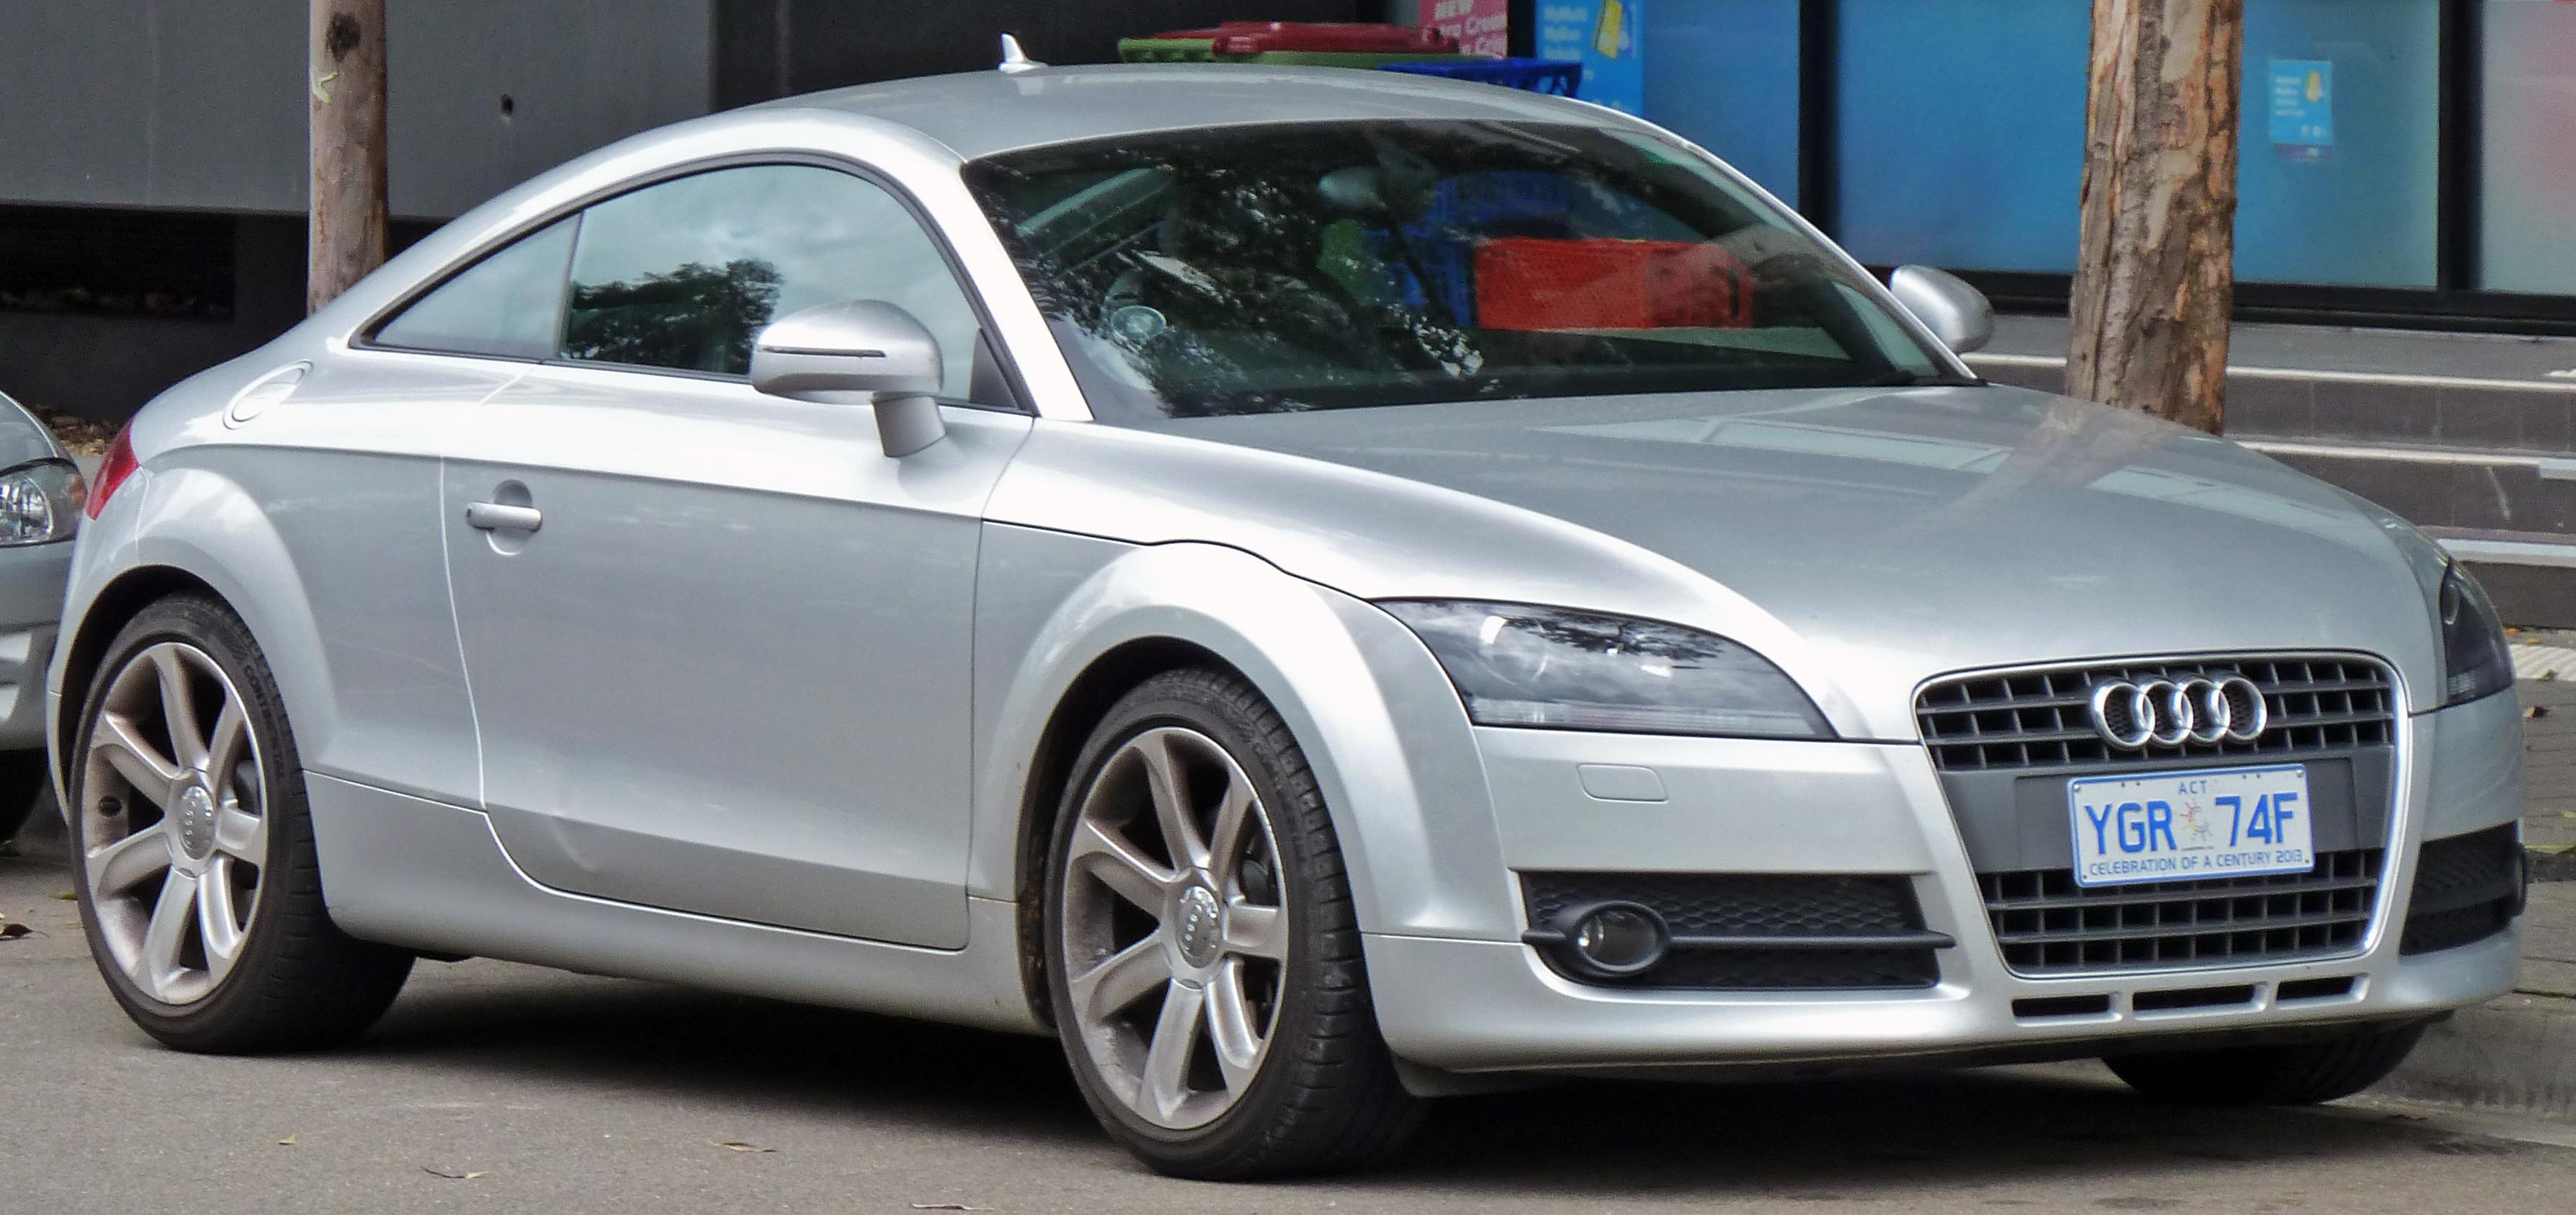 2010 Audi Tt Image 17